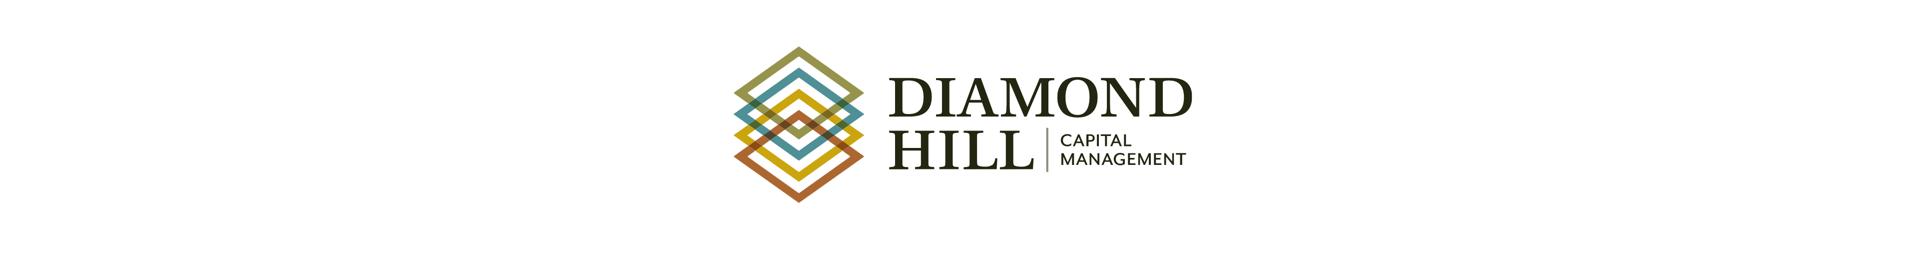 diamond hill header.png